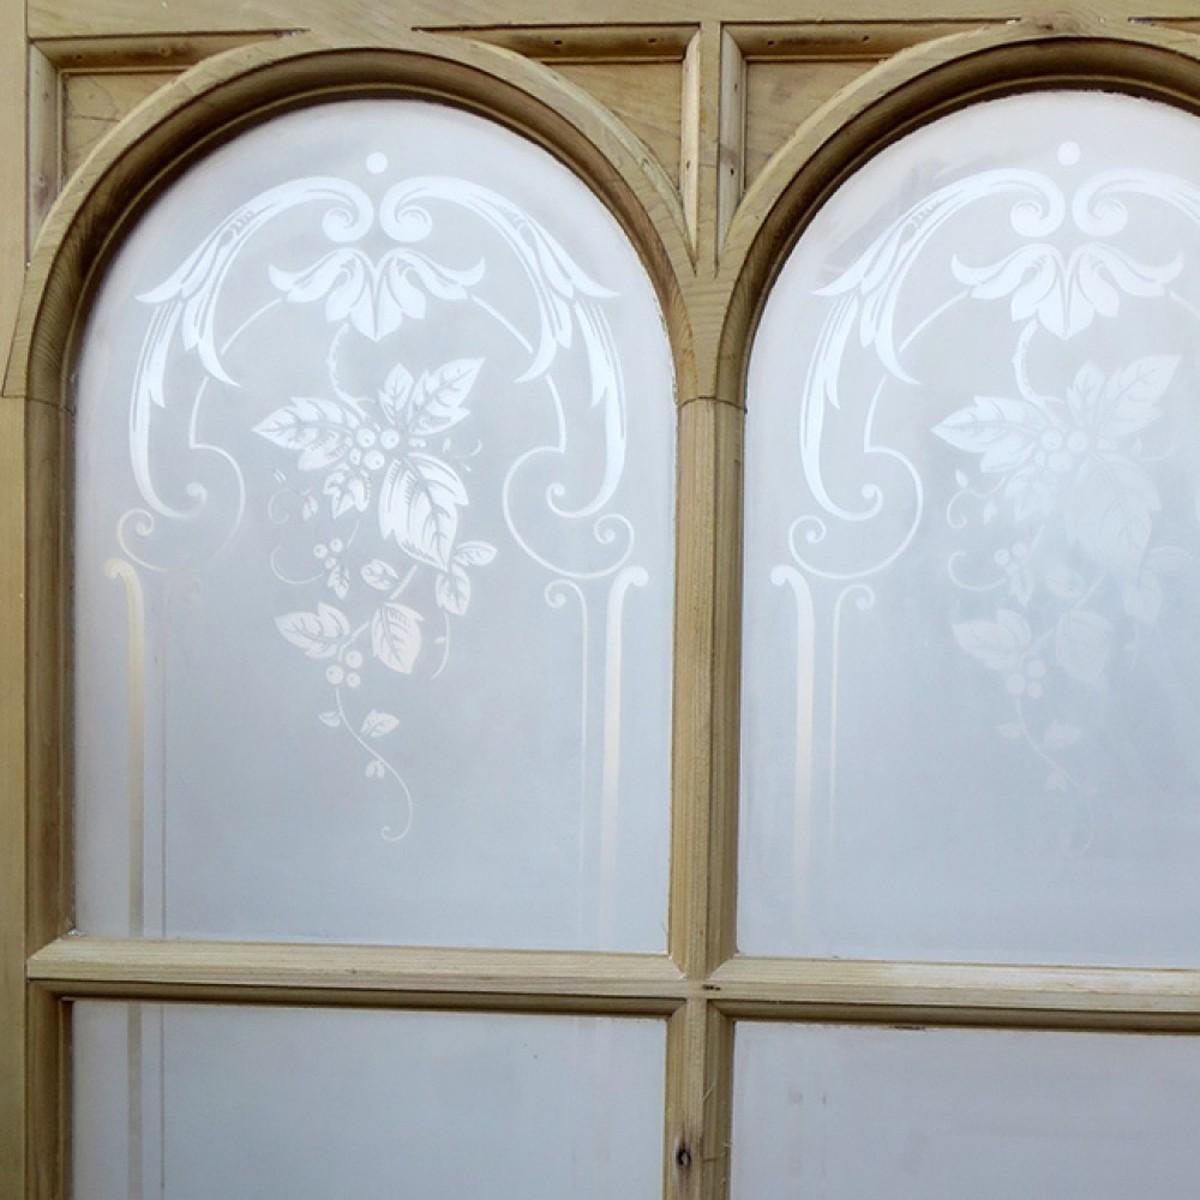 1200 #3C2913  Unrestored Original Arched Acid Etched Glass Exterior Door Cheshire wallpaper Etched Glass Front Doors 39351200